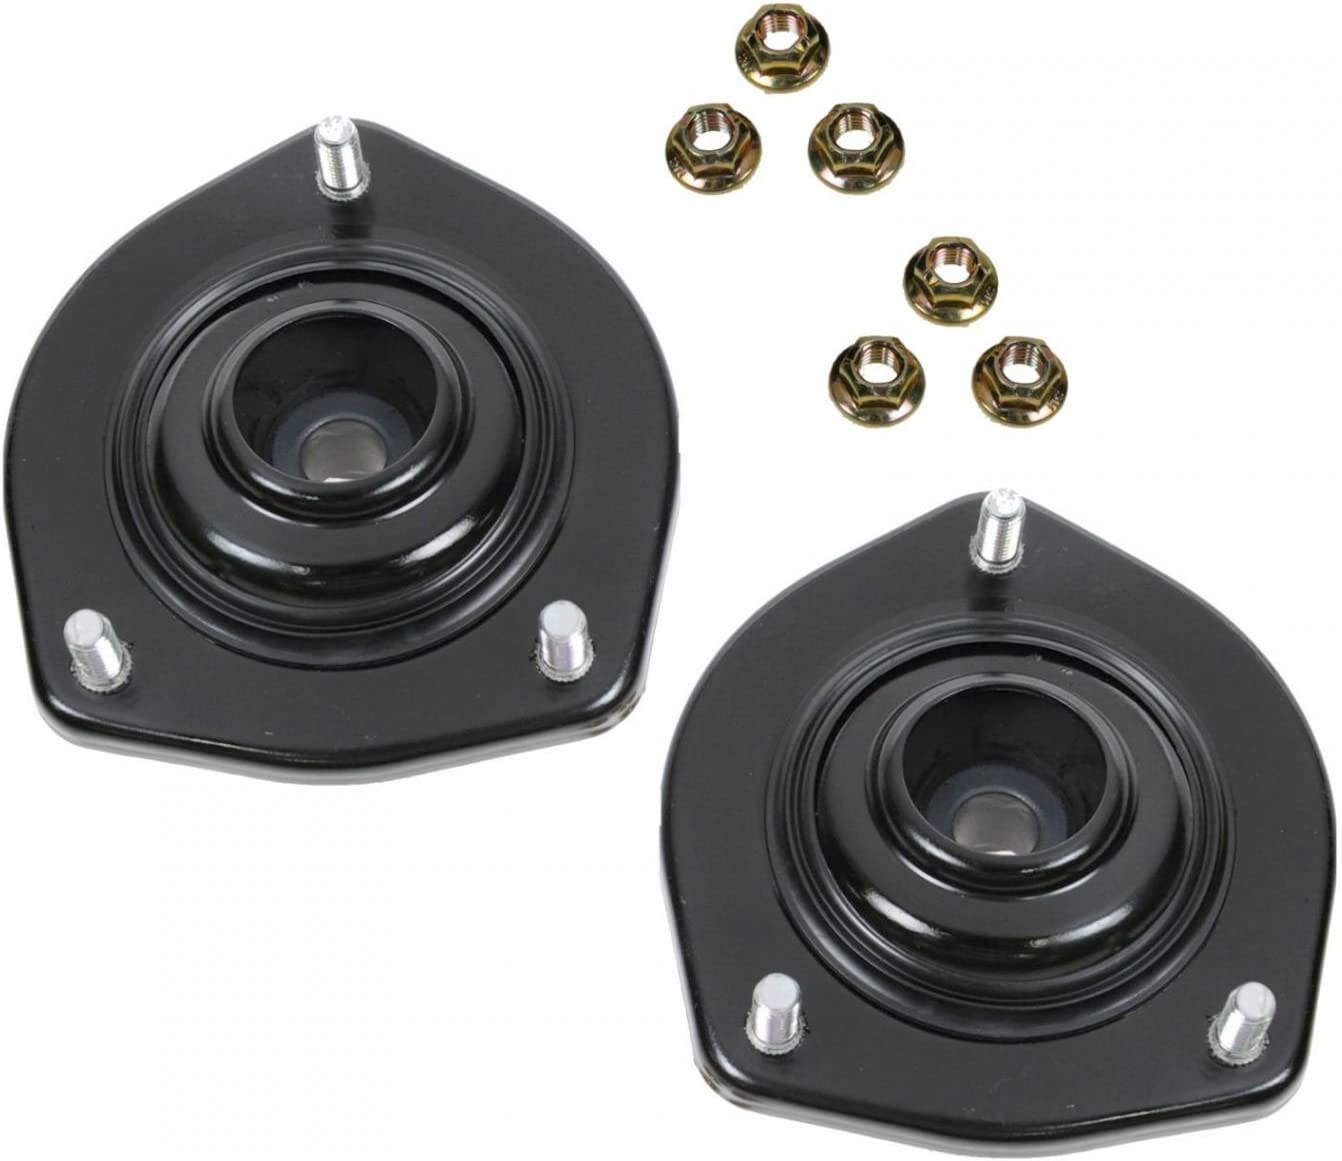 Rear Upper Shock Strut Mount Kit Plate Cushion Pair Set of 2 For Camry Avalon